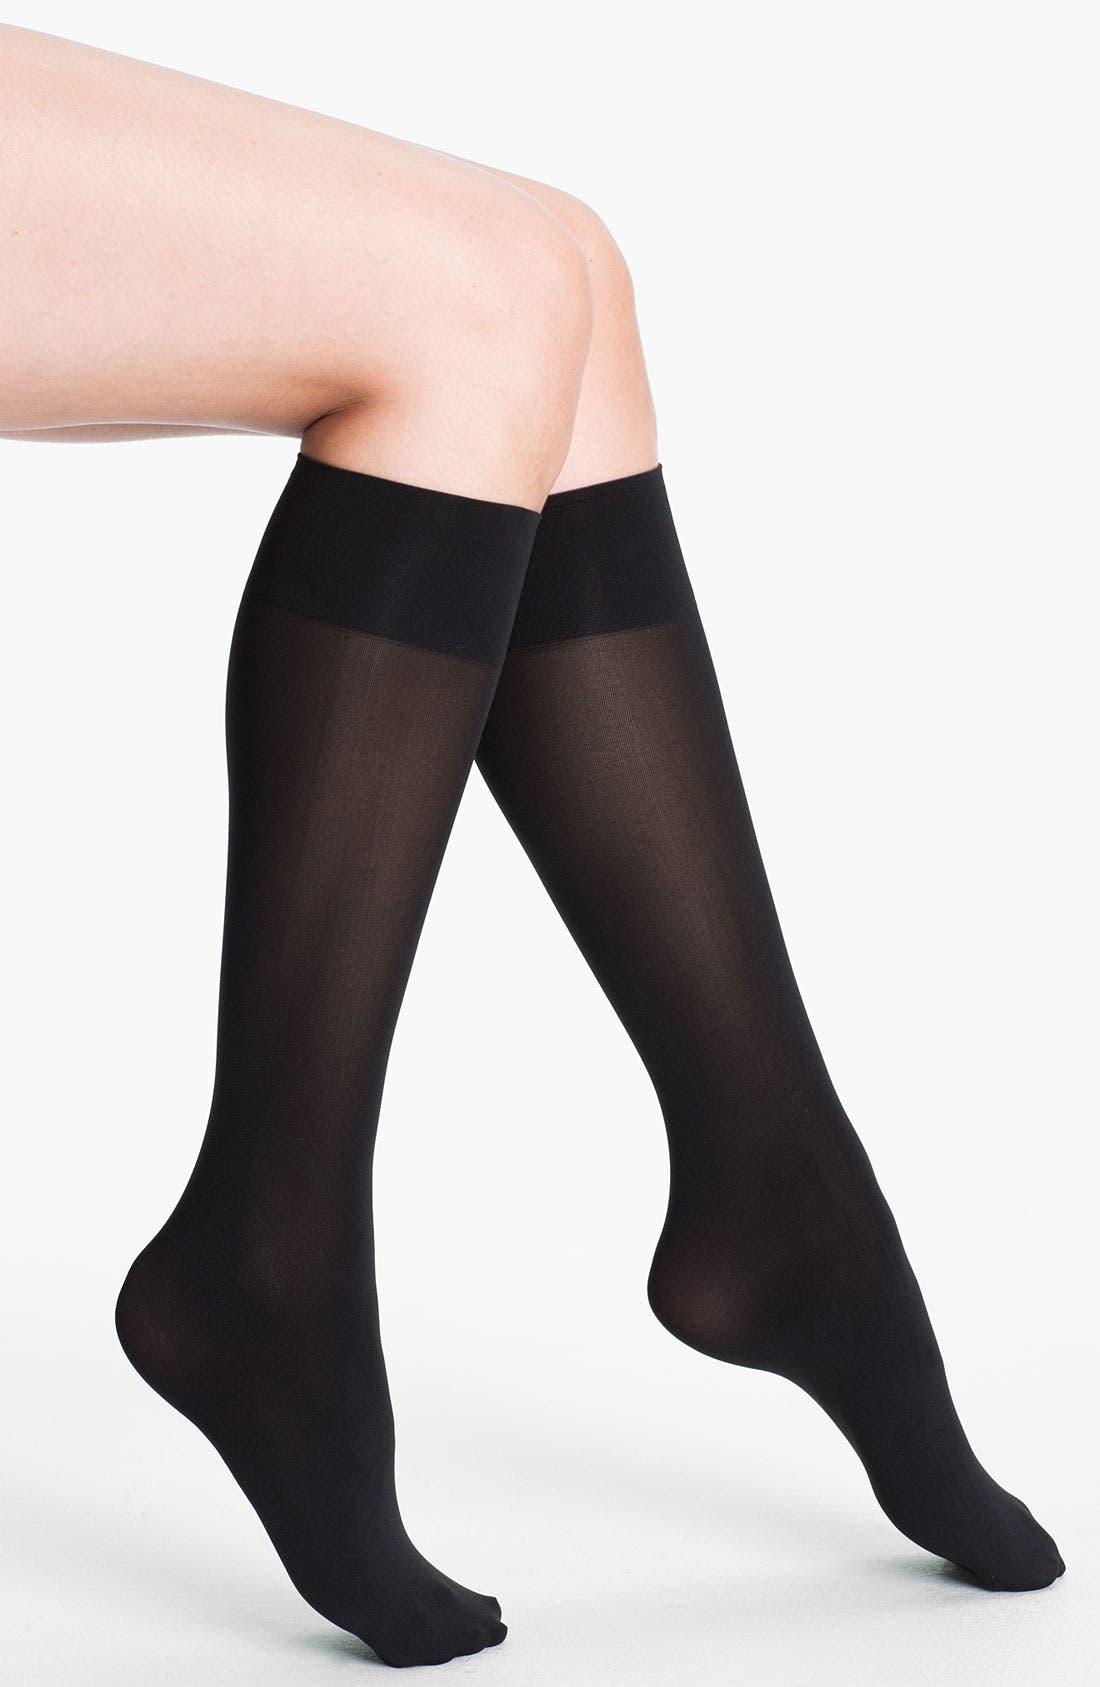 Alternate Image 1 Selected - Commando 'Ultimate' Opaque Trouser Socks